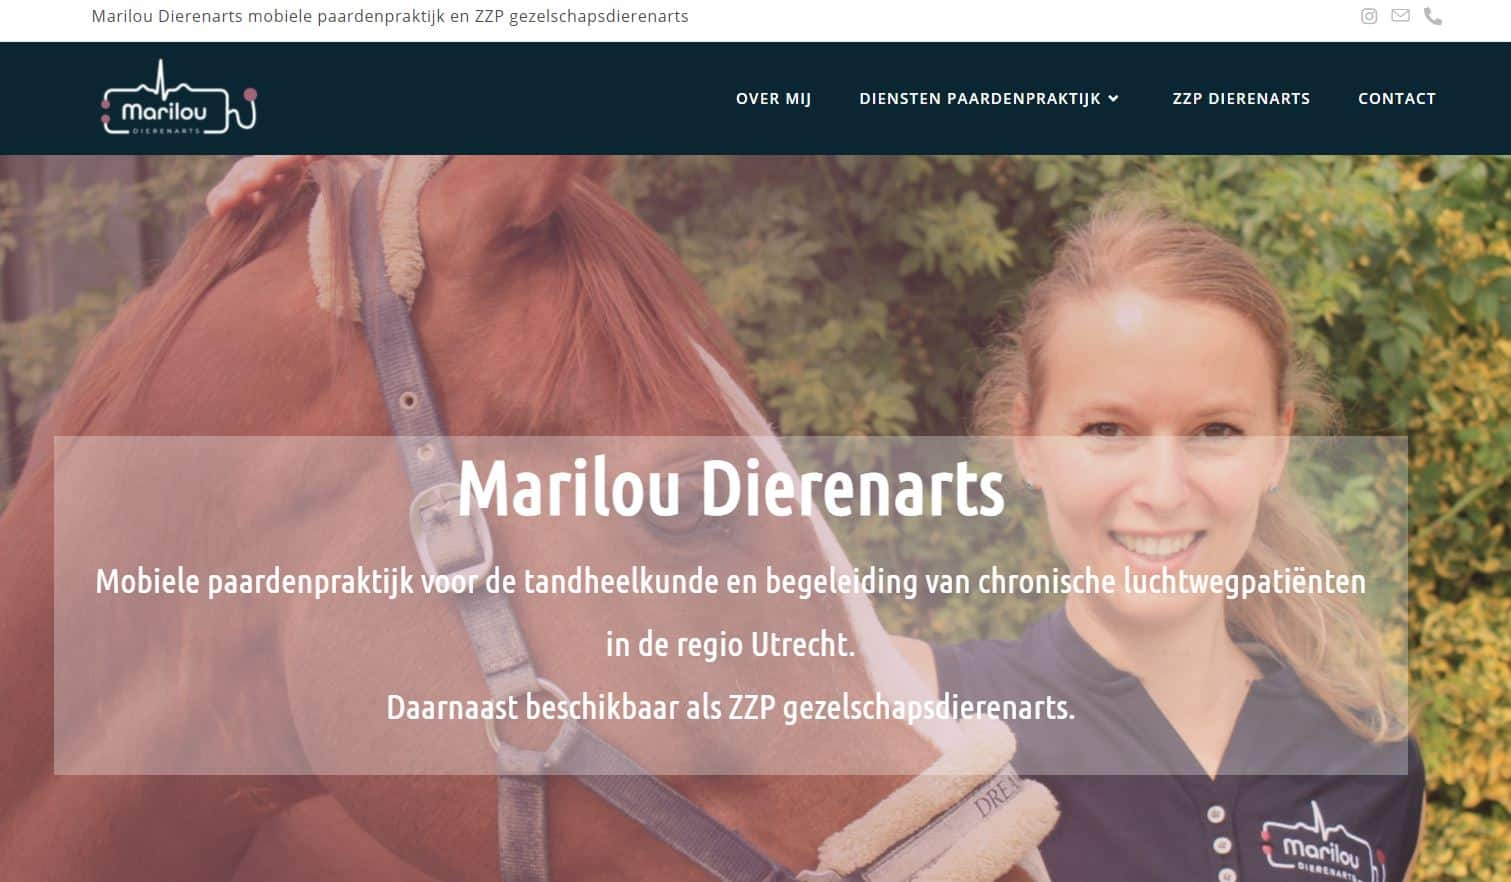 Marilou Dierenarts